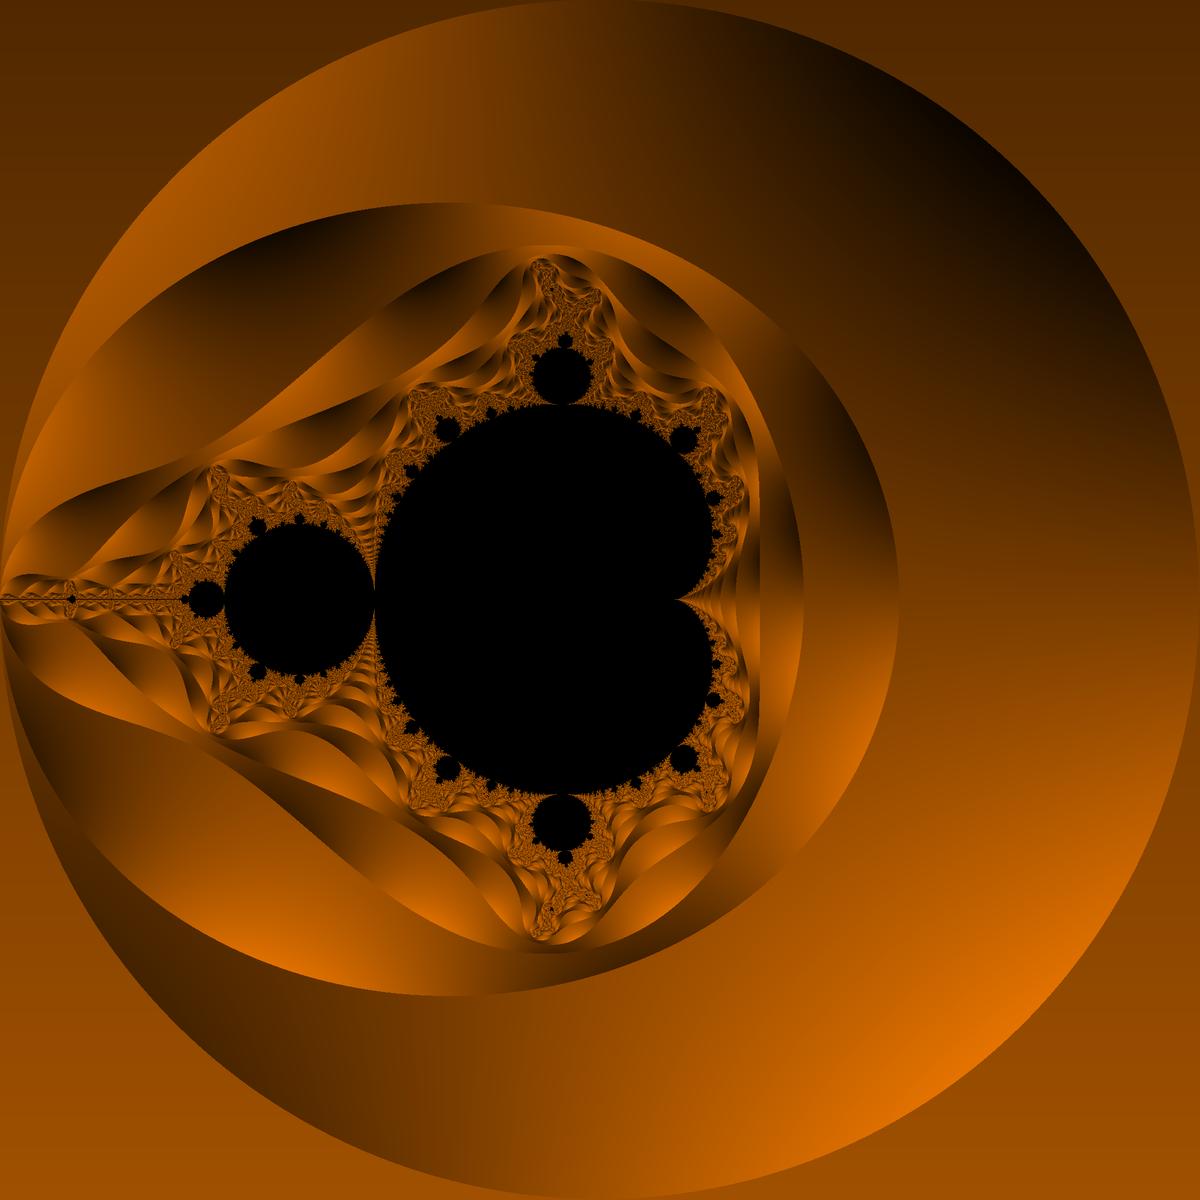 f:id:Hassium277:20210320160529p:plain